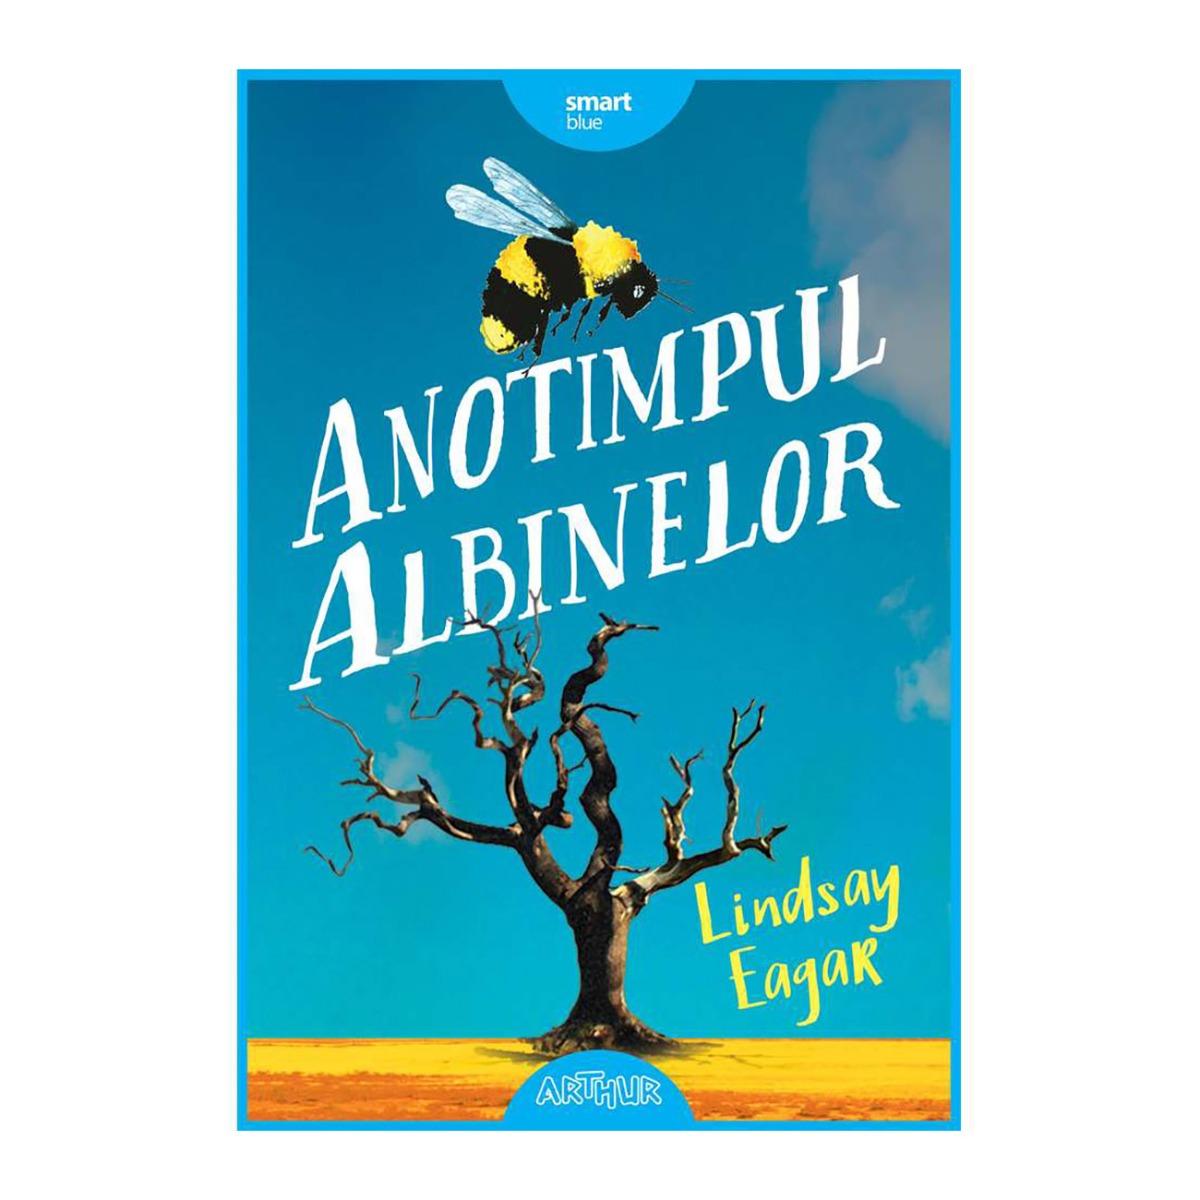 Carte Editura Arthur, Anotimpul albinelor, Lindsay Eagar